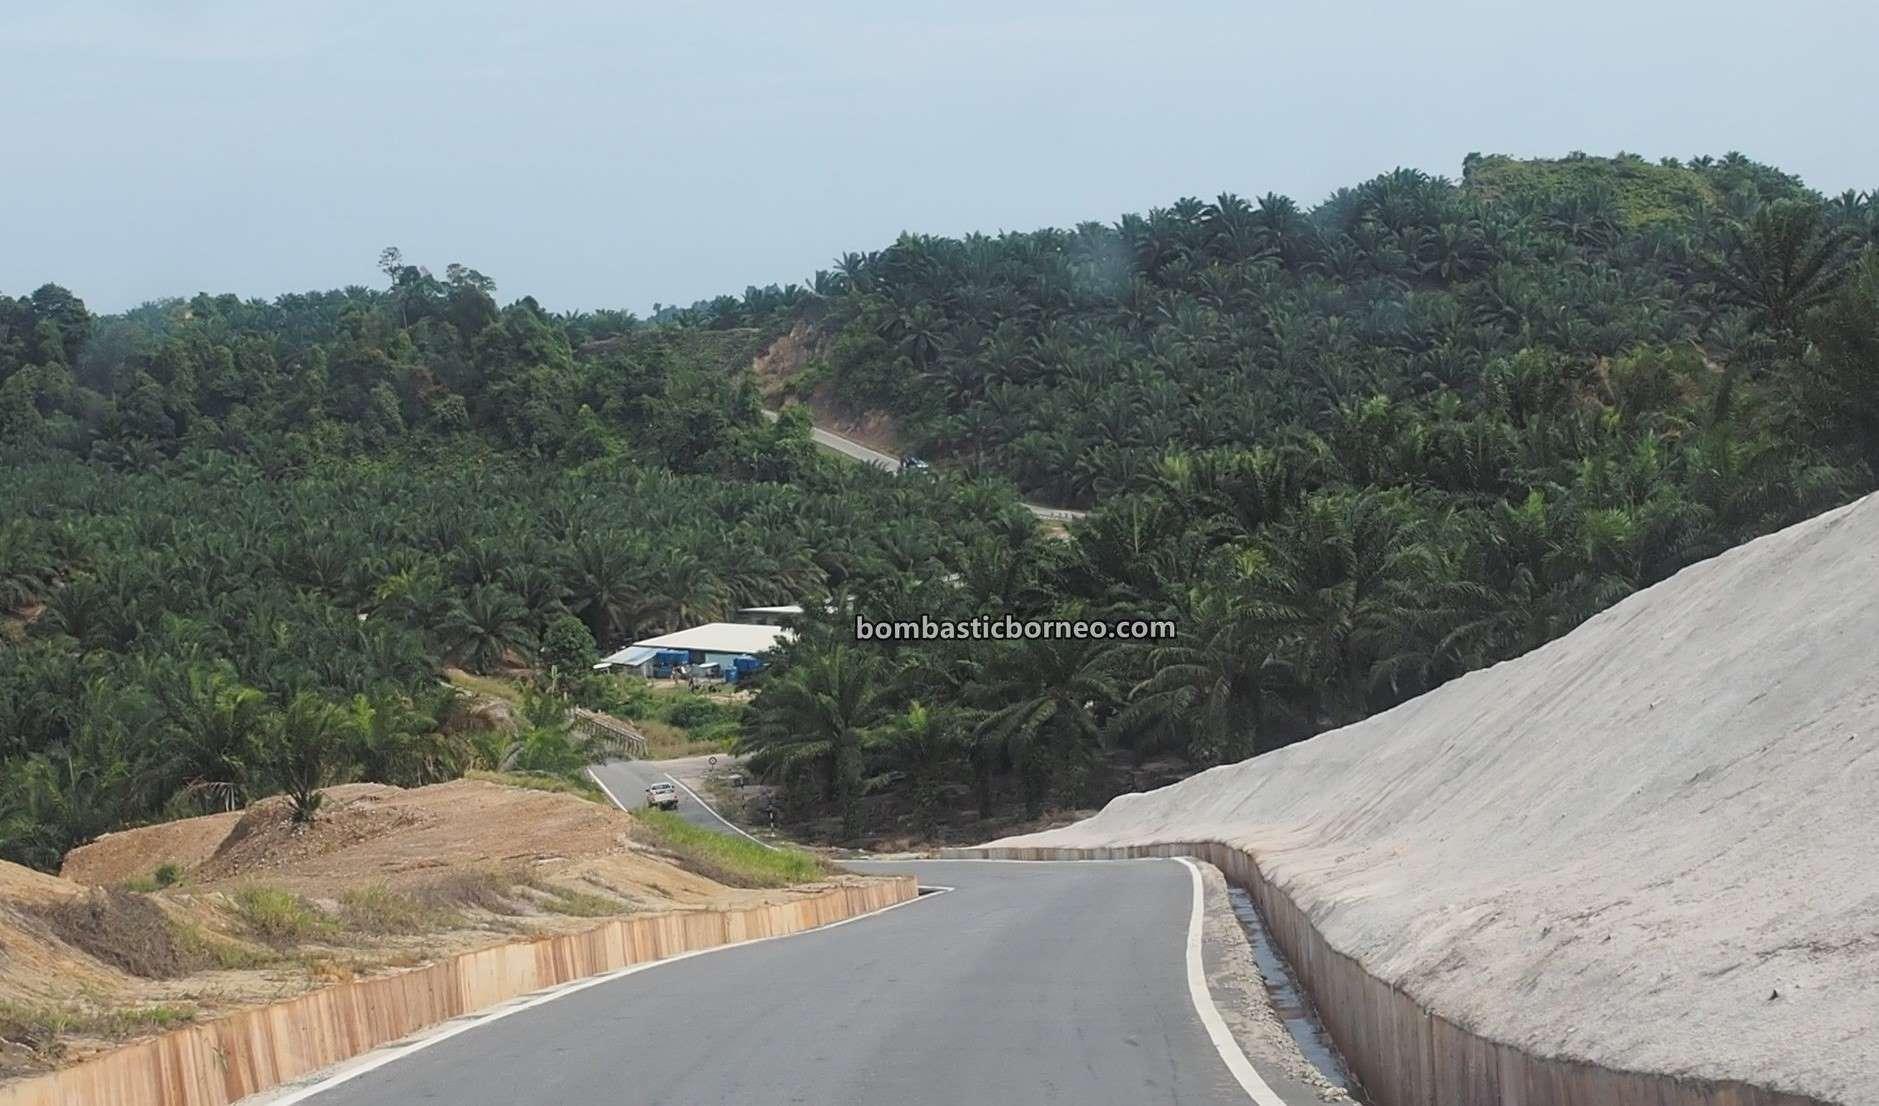 adventure, Transportation, interior, backpackers, Sungai Baram, tourism, tourist attraction, travel guide, Trans Border, Borneo, 探索马来西亚内陆, 砂拉越美里马鲁帝